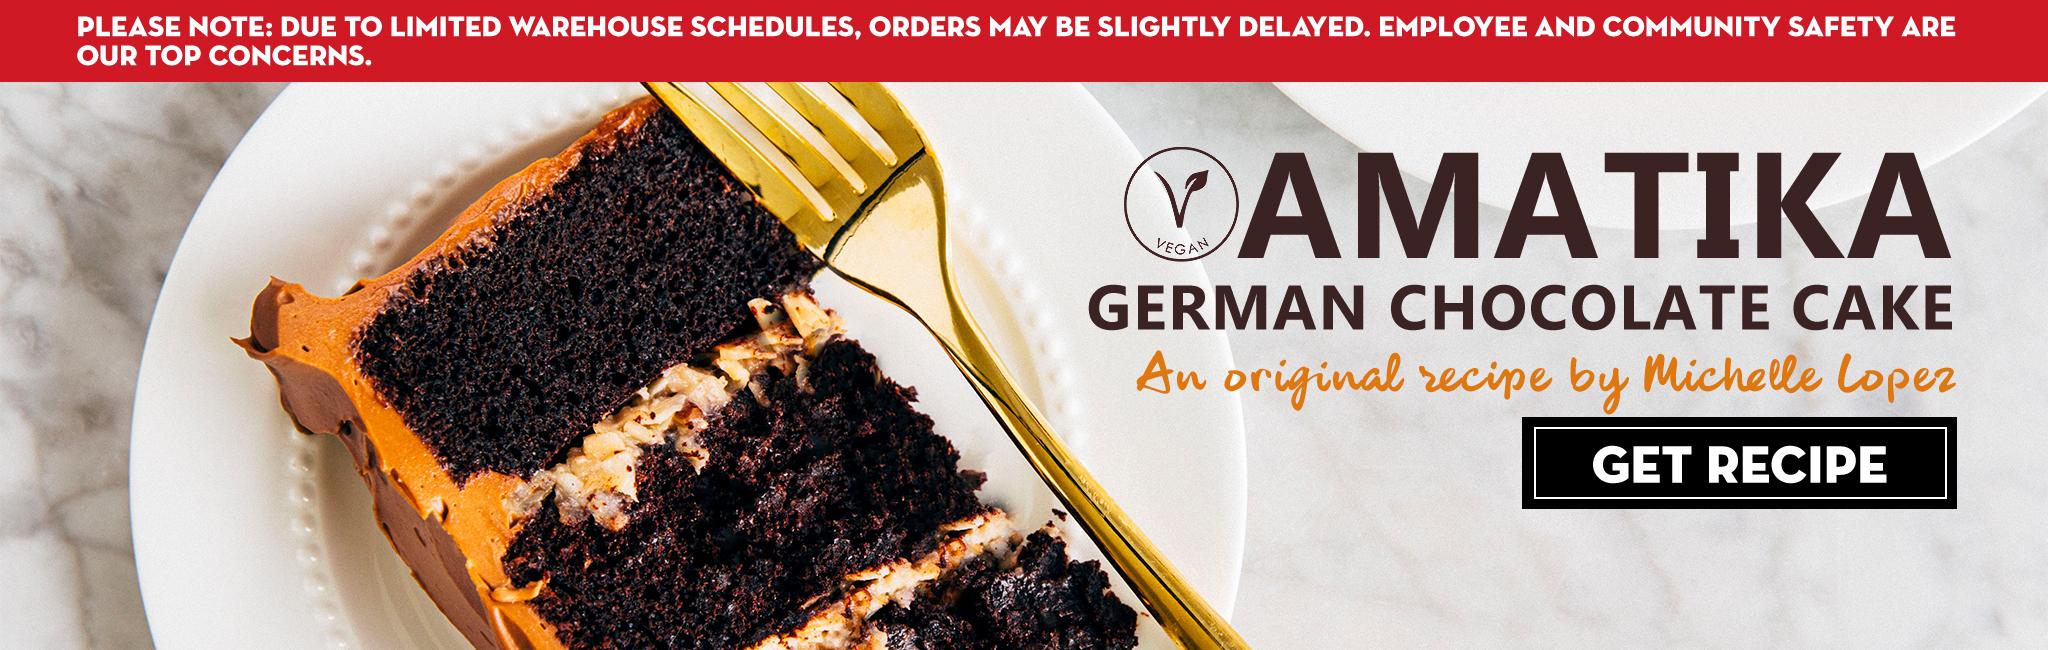 AMATIKA VEGAN GERMAN CHOCOLATE CAKE